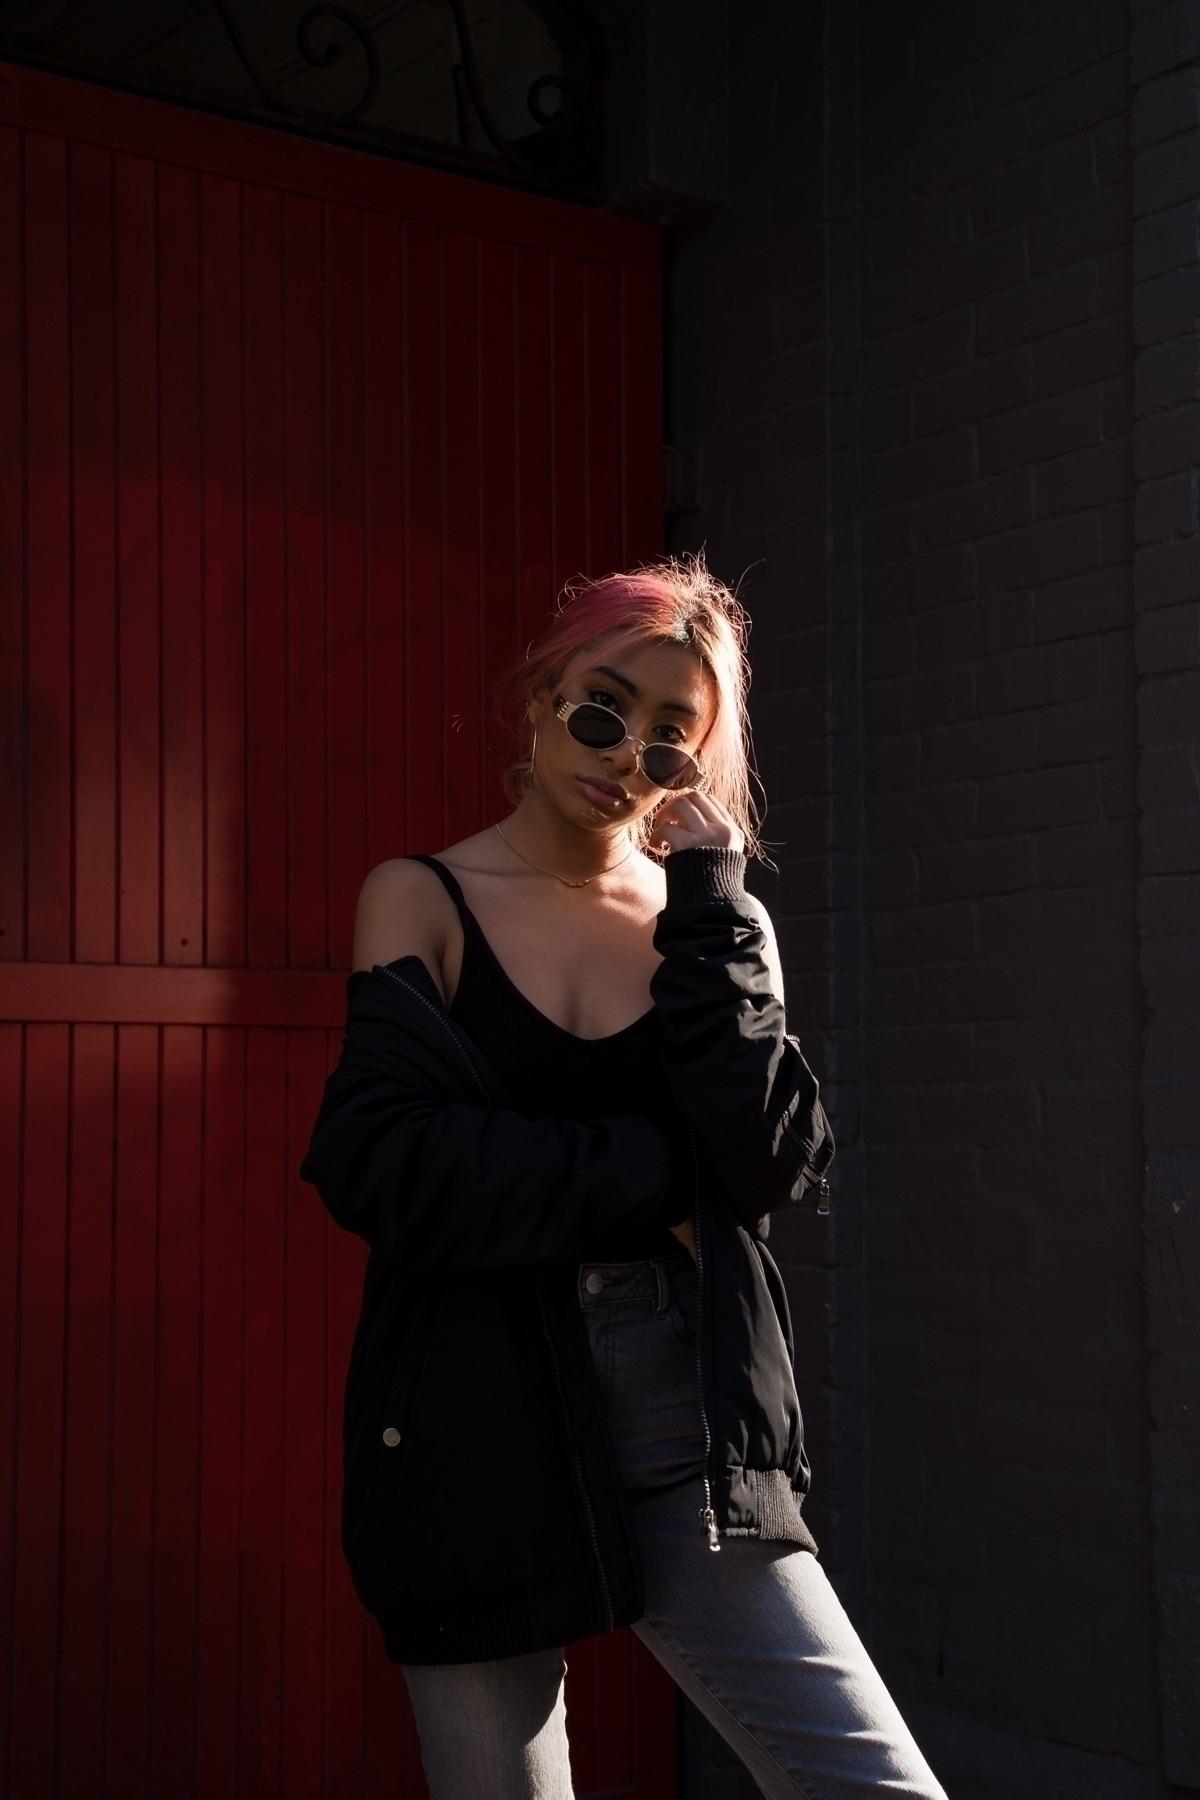 dressed black series - ello, ellonew - mariekeady | ello